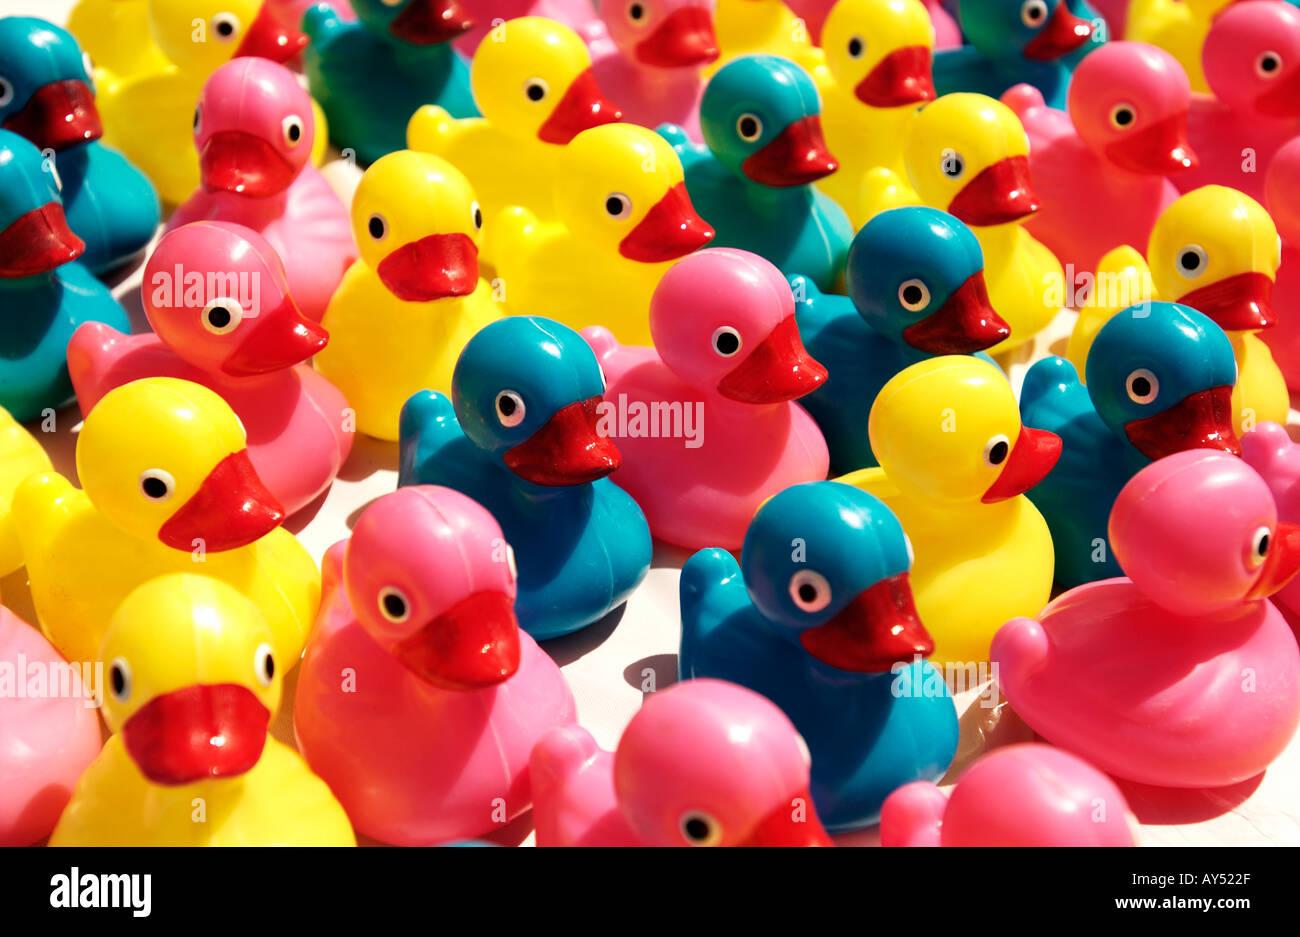 Colorful plastic ducks - Stock Image